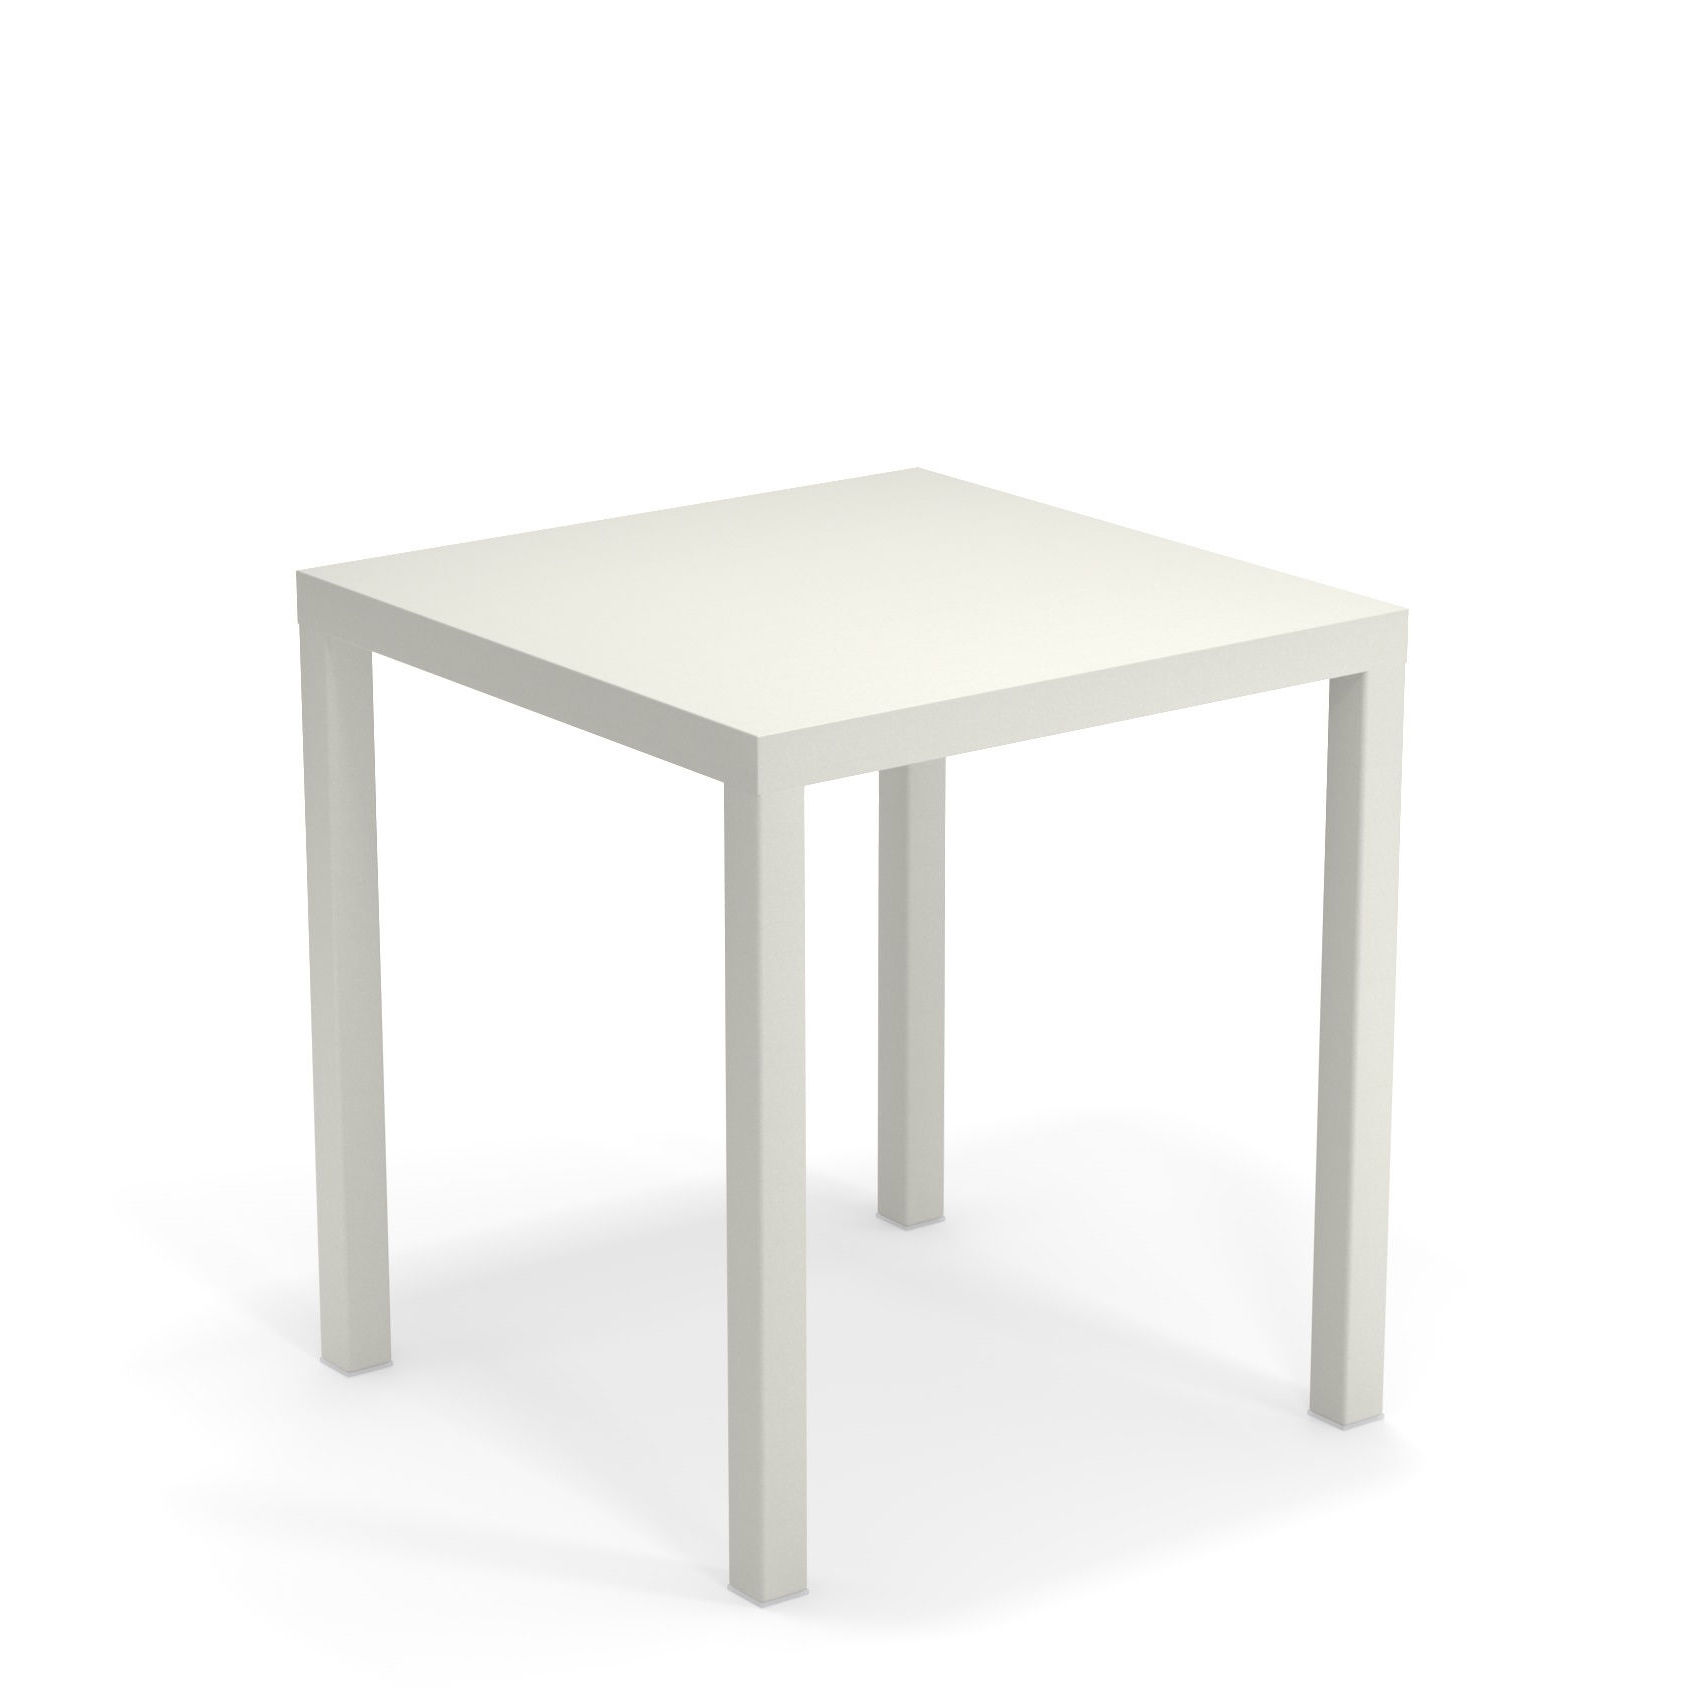 Outdoor - Tables de jardin - Table carrée Nova / Métal - 70 x 70 cm - Emu - Blanc - Acier verni